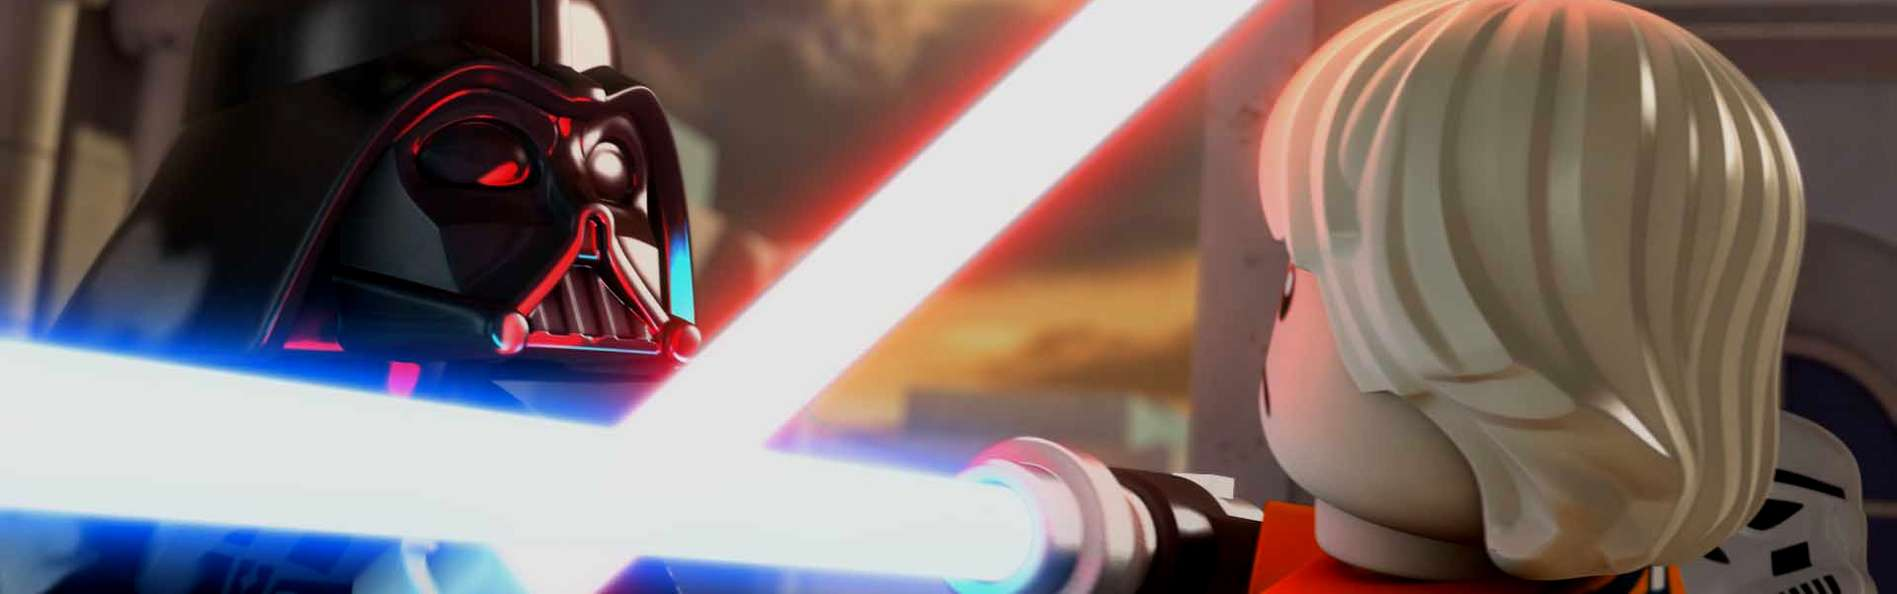 'LEGO Star Wars'. Foto: Lucasfilm Television